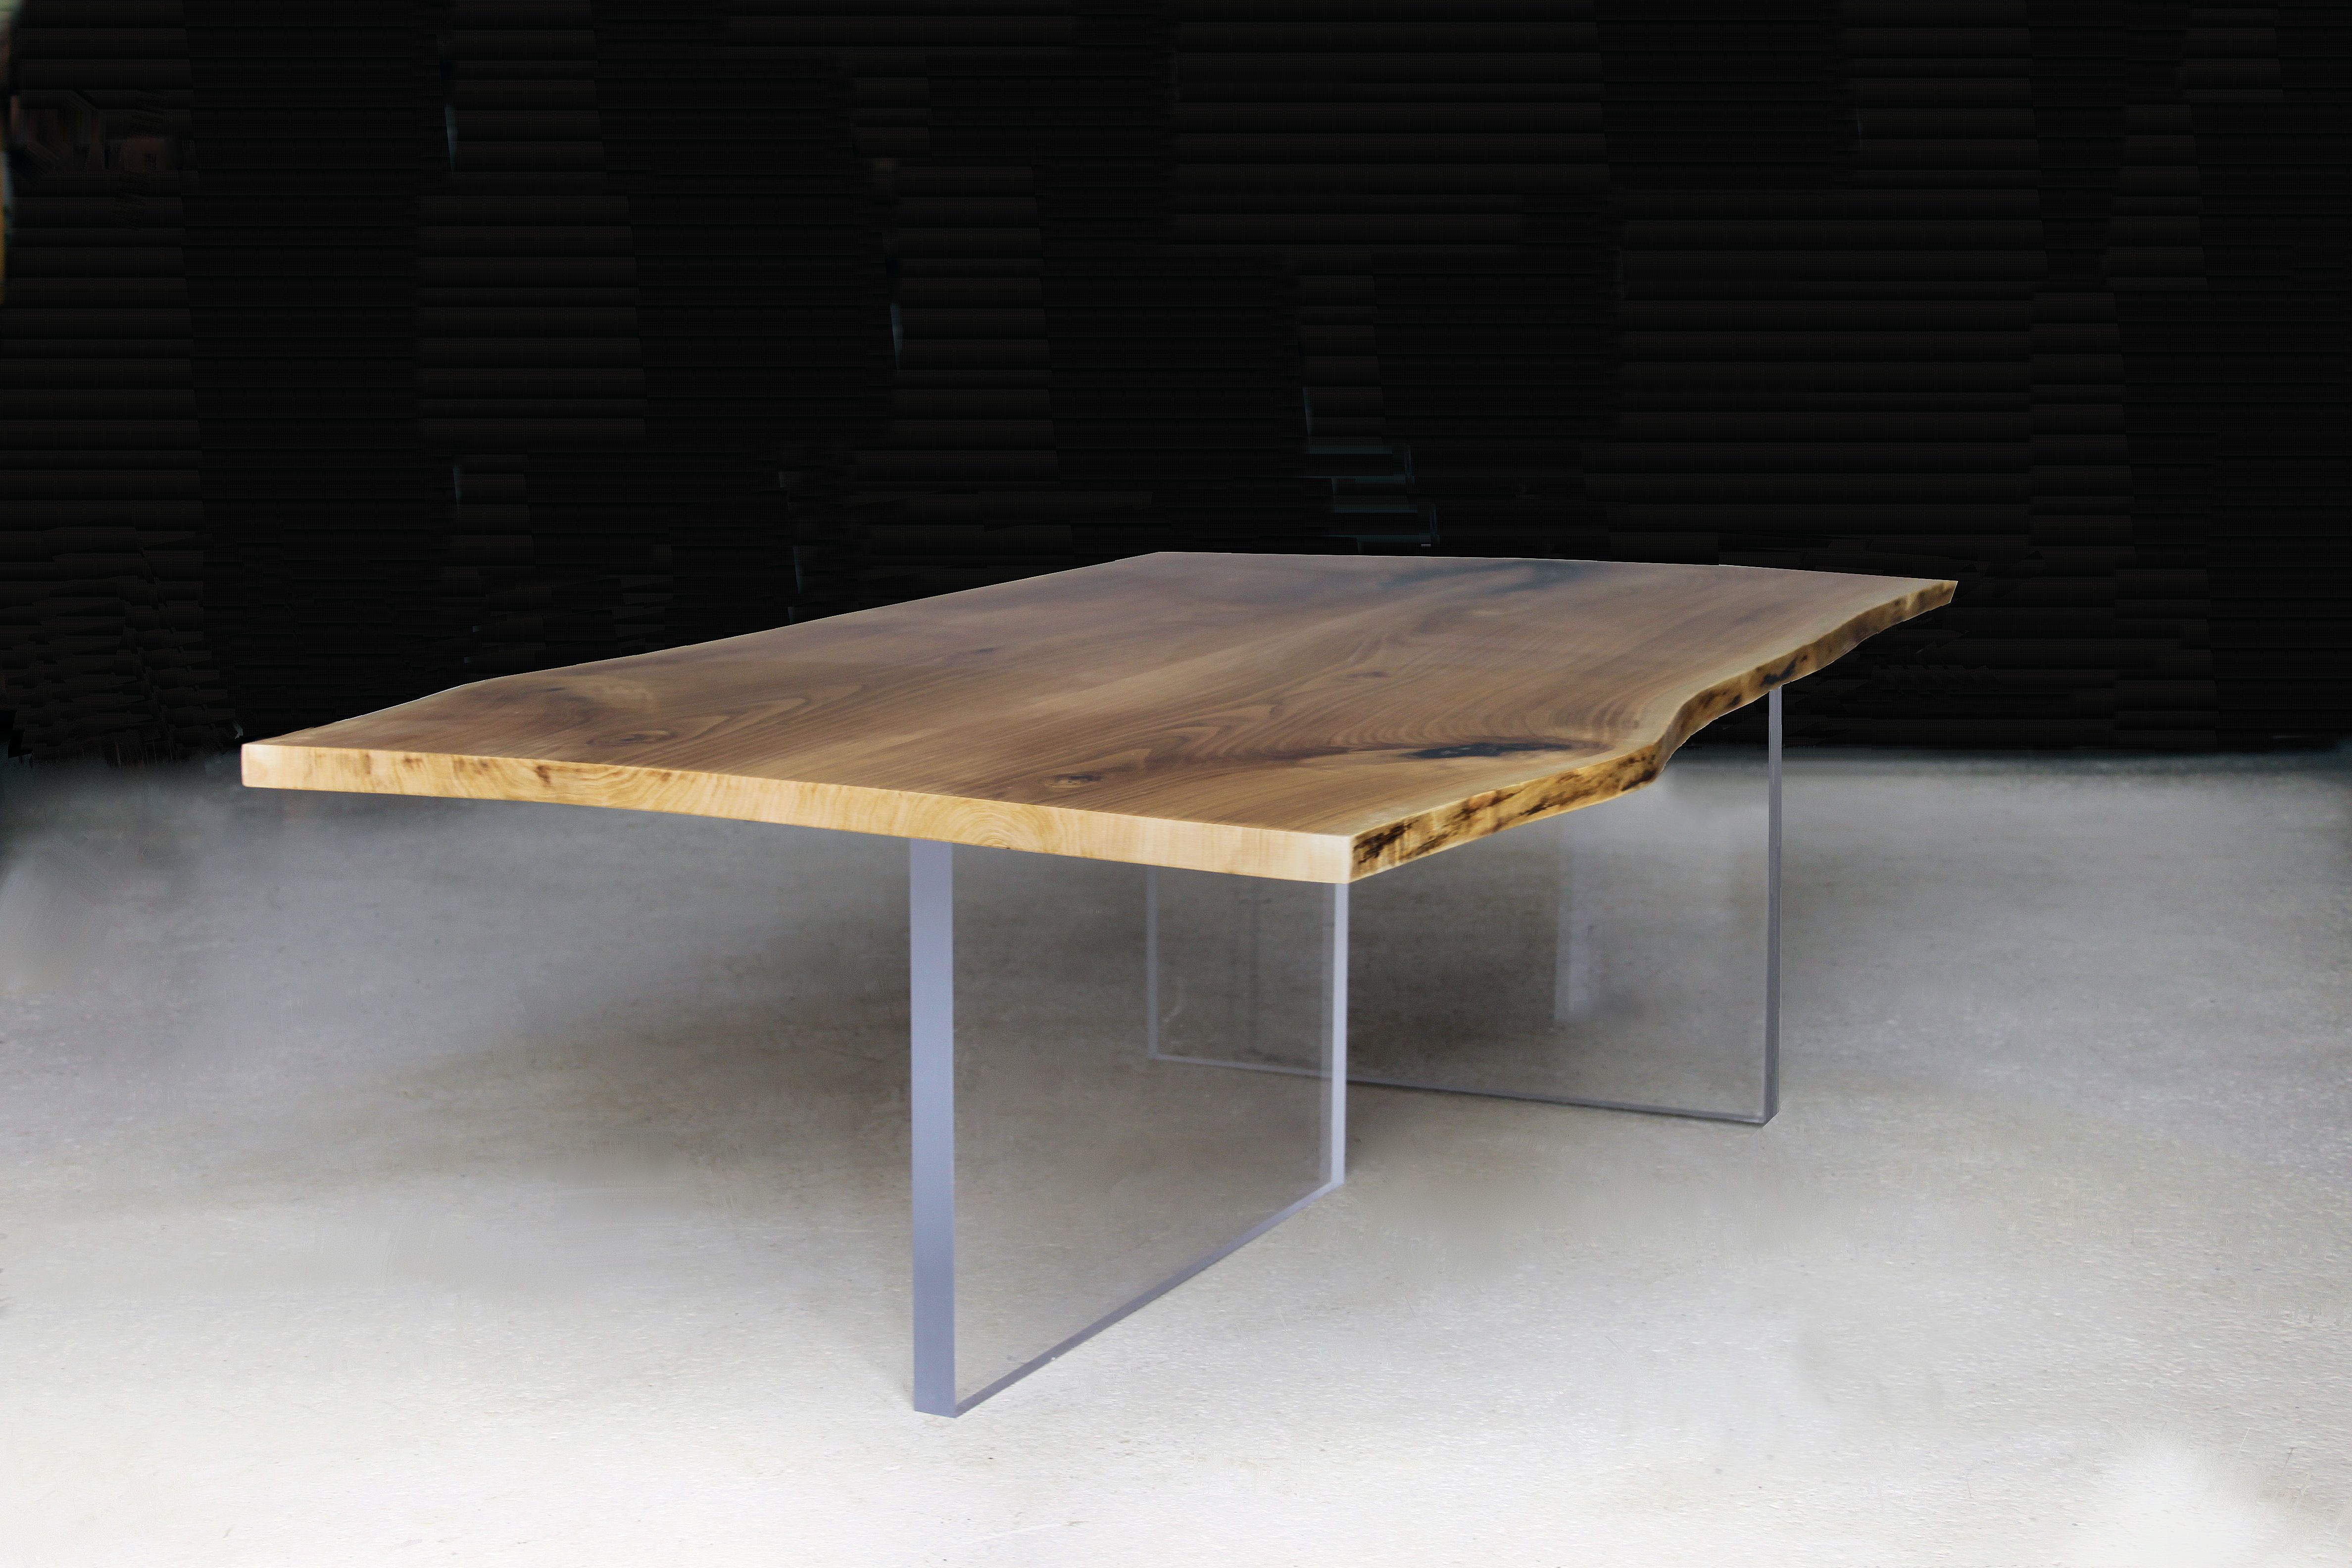 Ray Bachand S Custom Furniture Design At 60nobscot Acrylic Coffee Table Coffee Table Custom Furniture Design [ 3168 x 4752 Pixel ]